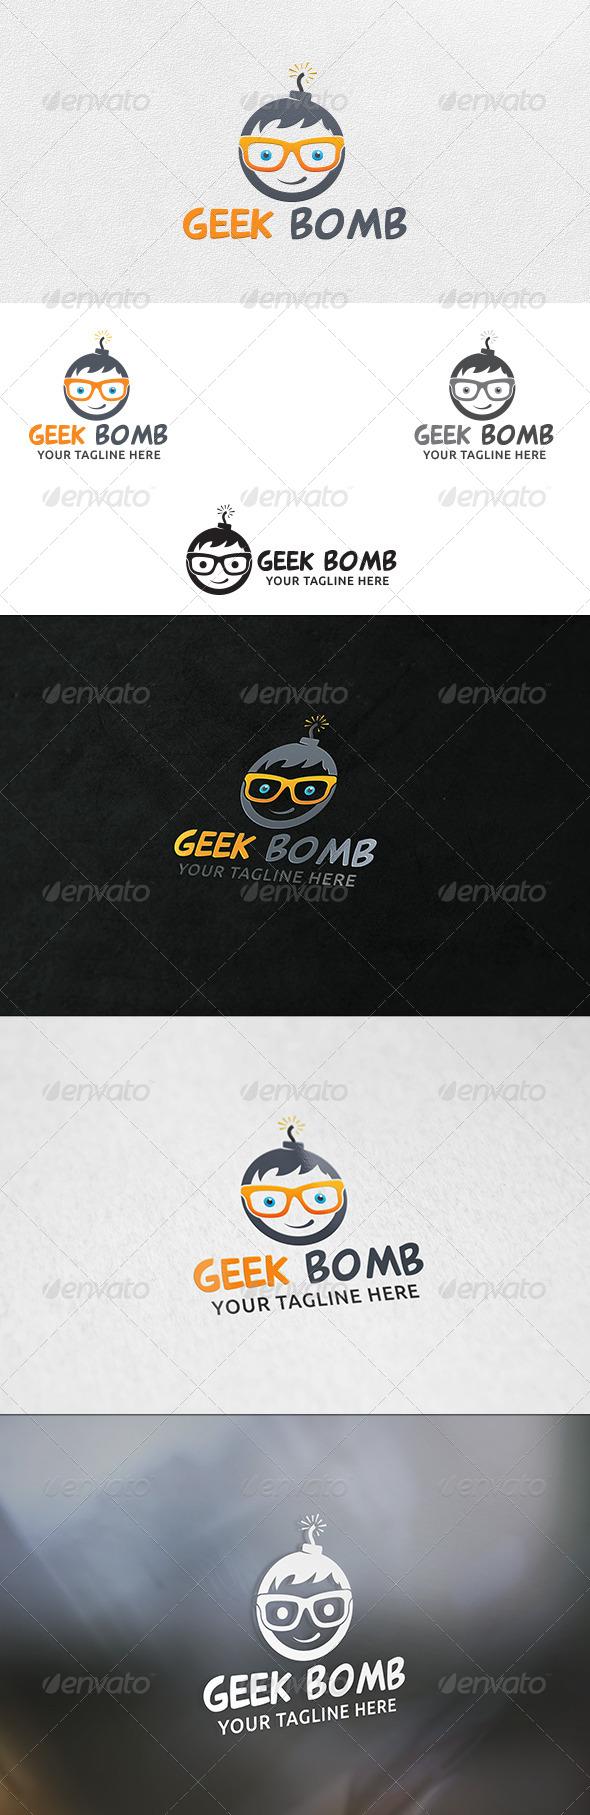 Geek Bomb V2 - Logo Template - Humans Logo Templates